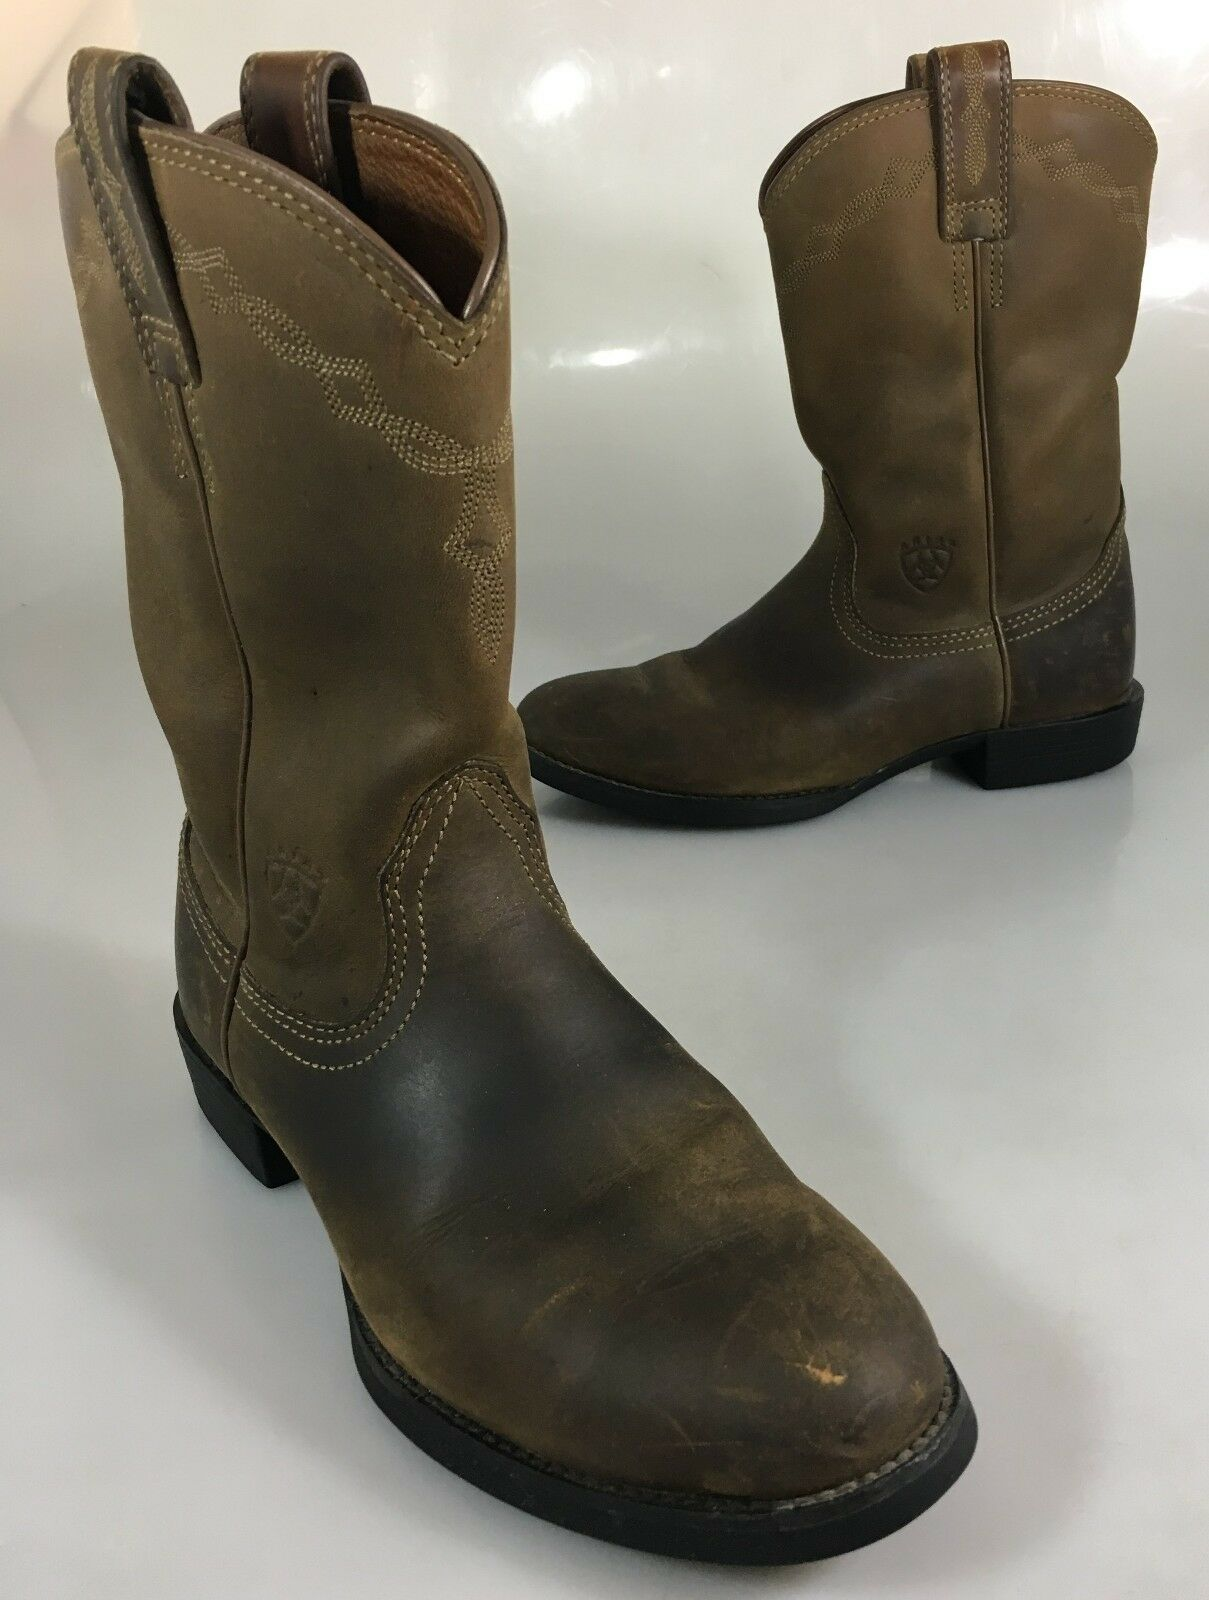 Ariat Damens 6.5B Heritage Roper Braun Leder Lt Distress Cowboy Western Stiefel